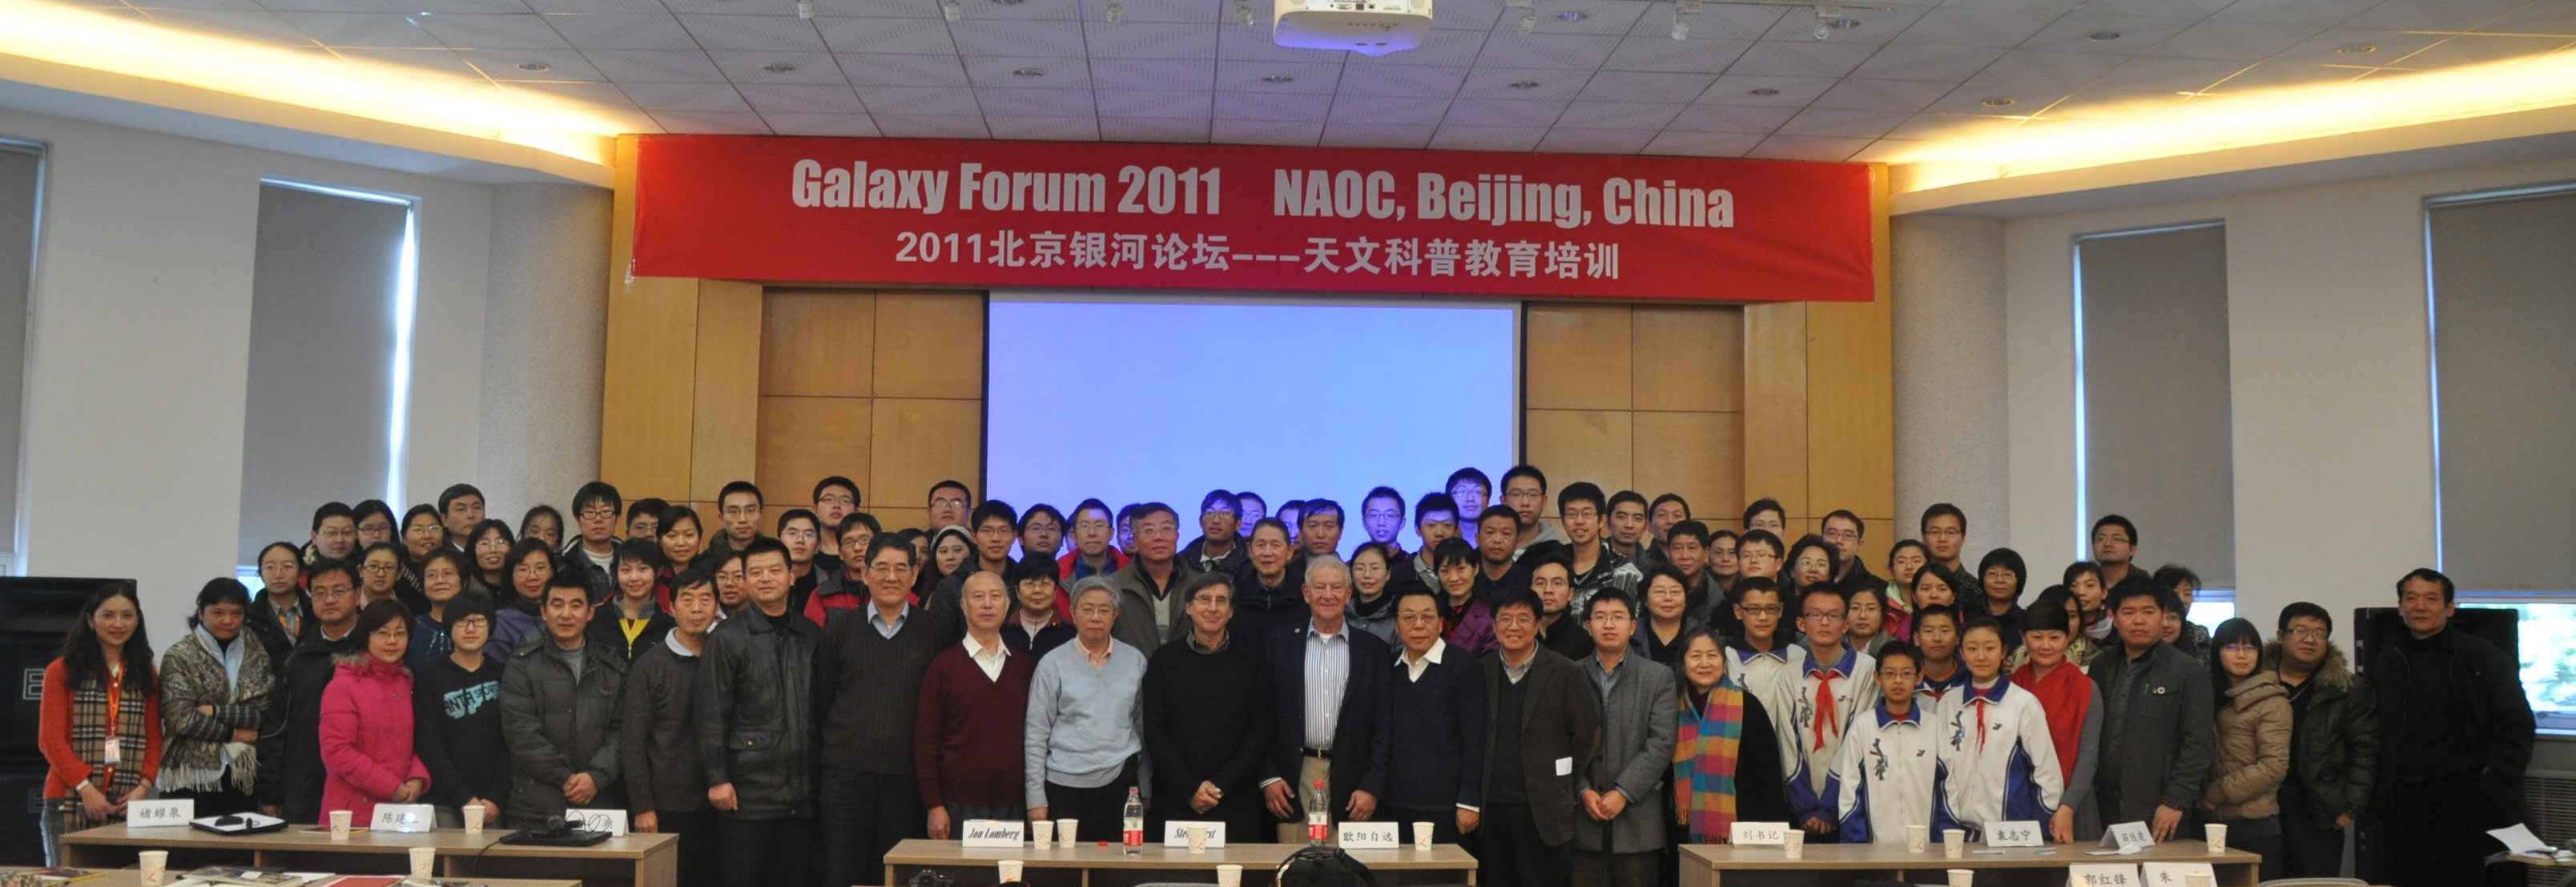 Galaxy Forum China 2011 NAOC Beijing